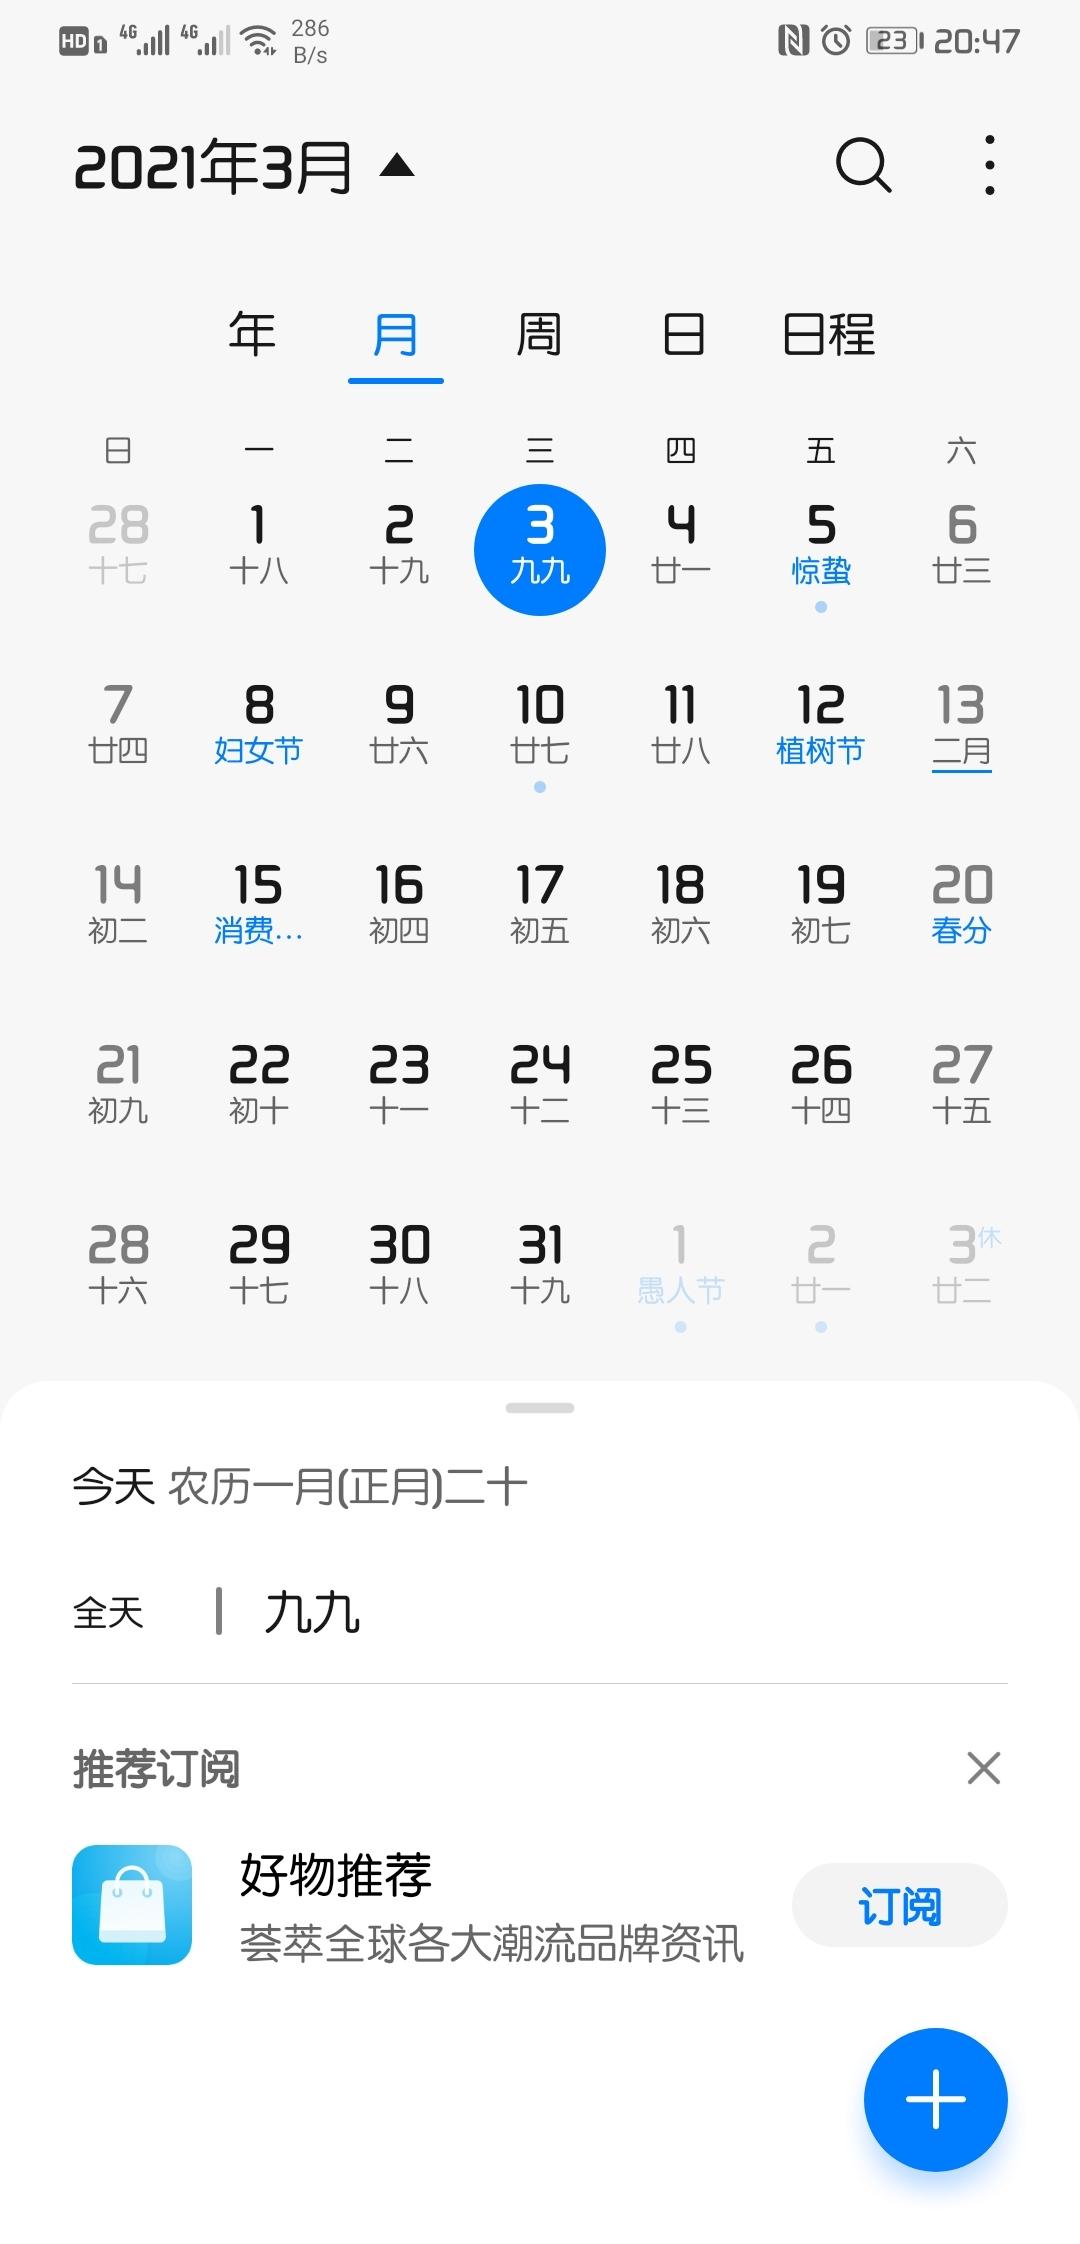 Screenshot_20210303_204714_com.android.calendar.jpg